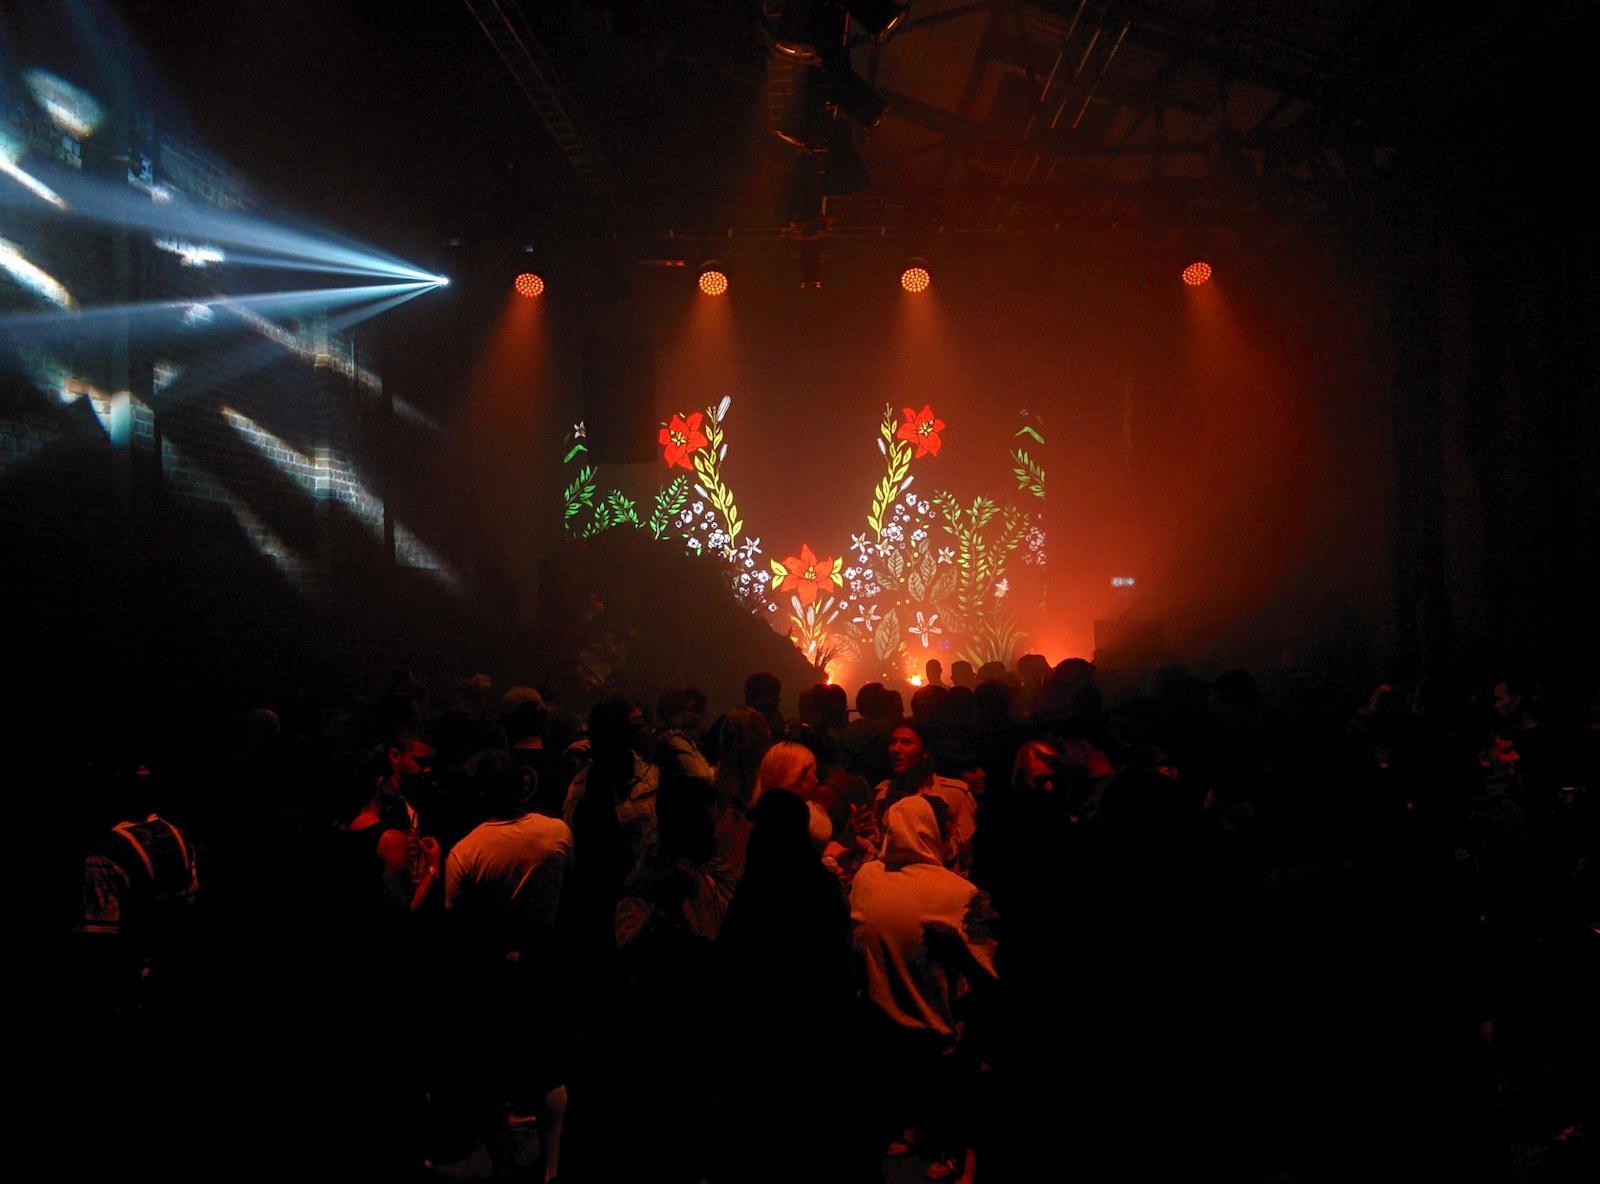 NikeLab x Riccardo Tisci Live Show